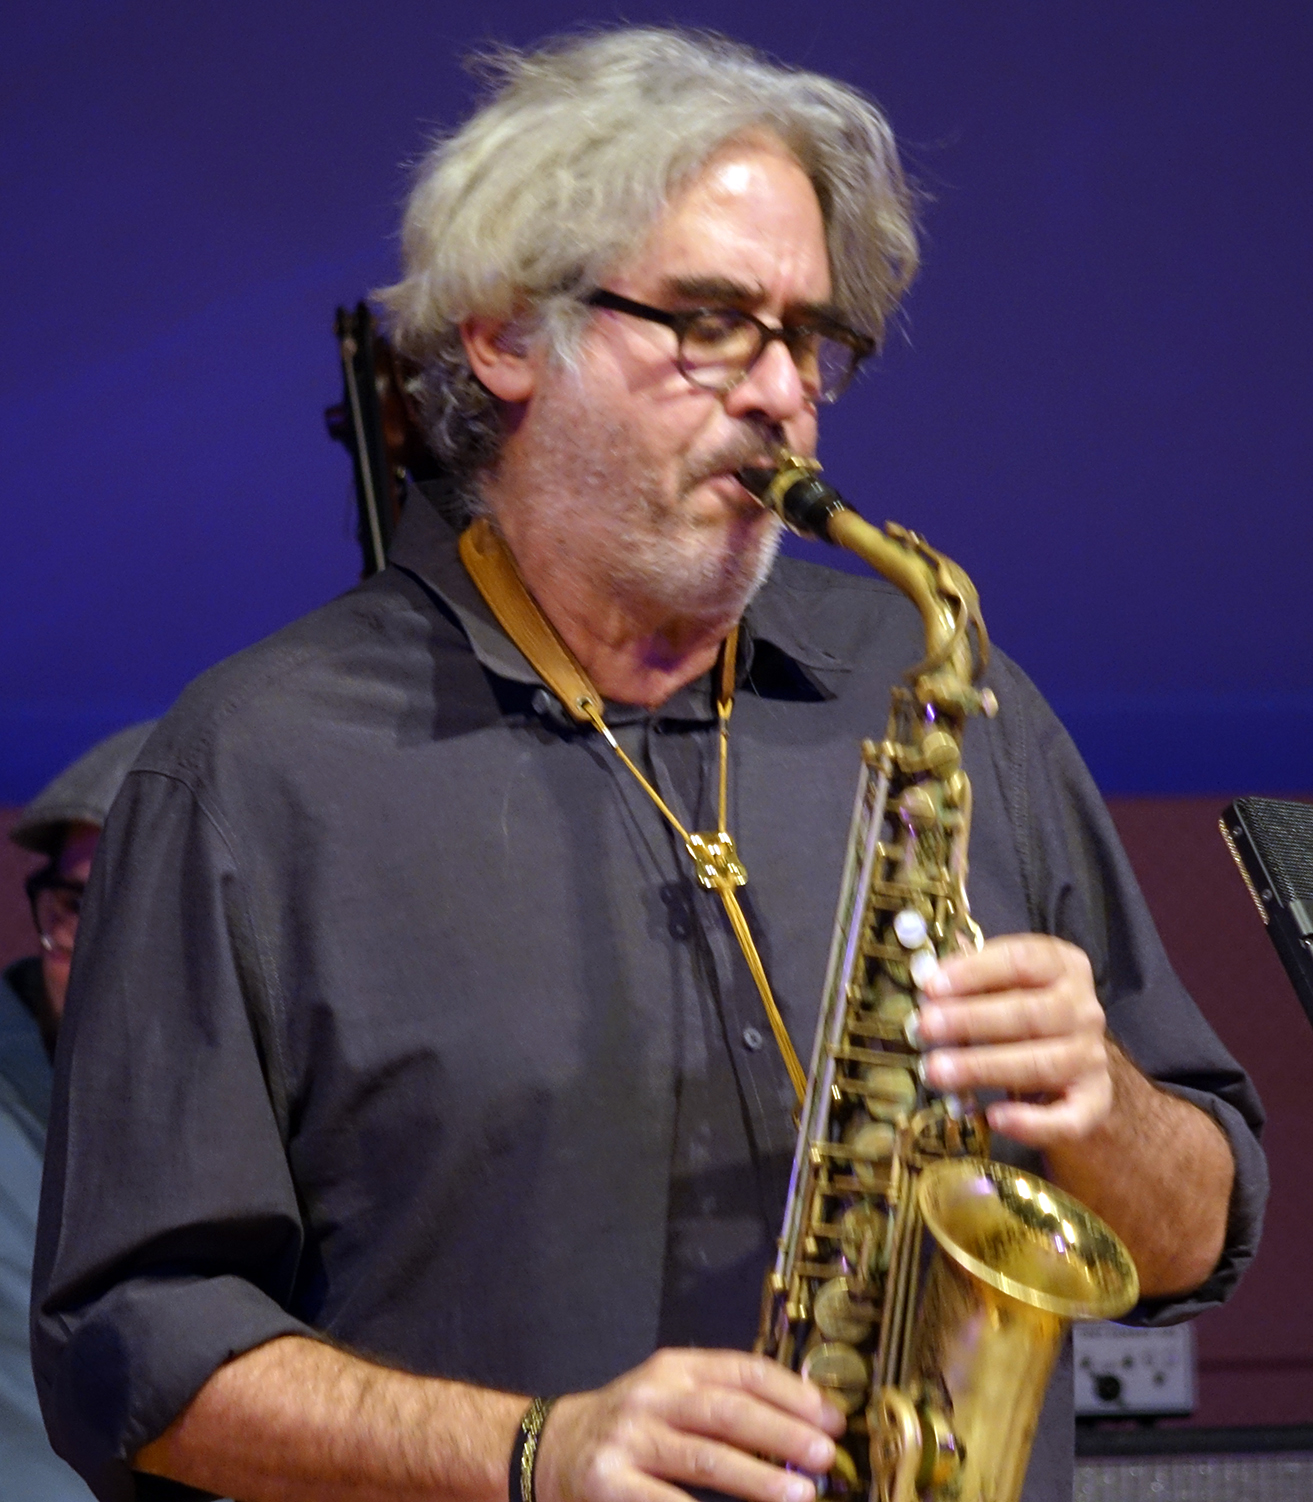 Tim Berne at NYC Winter JazzFest 2016